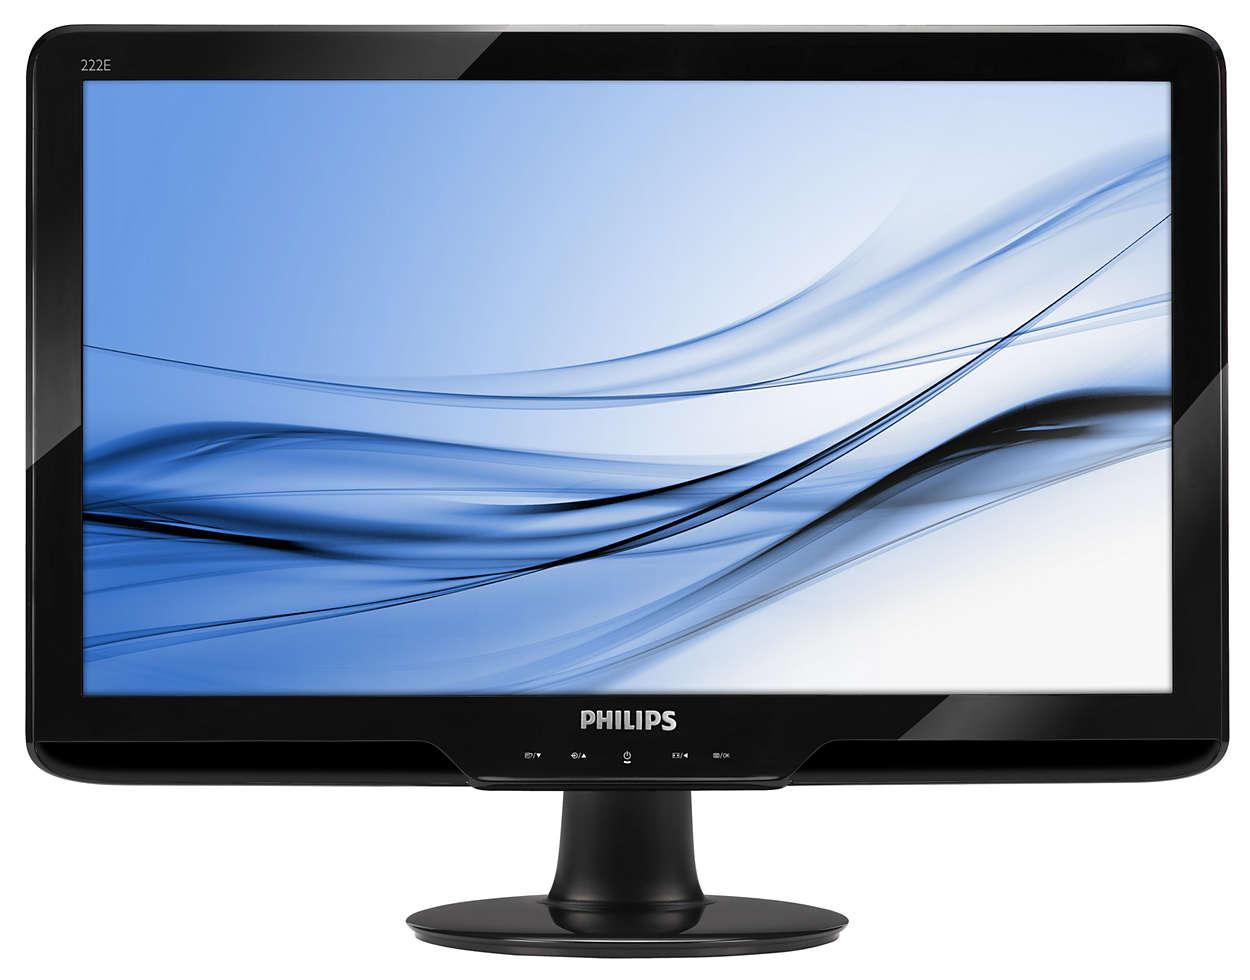 Eleganter Full HD-Monitor mit gutem Preis-Leistungs-Verhältnis